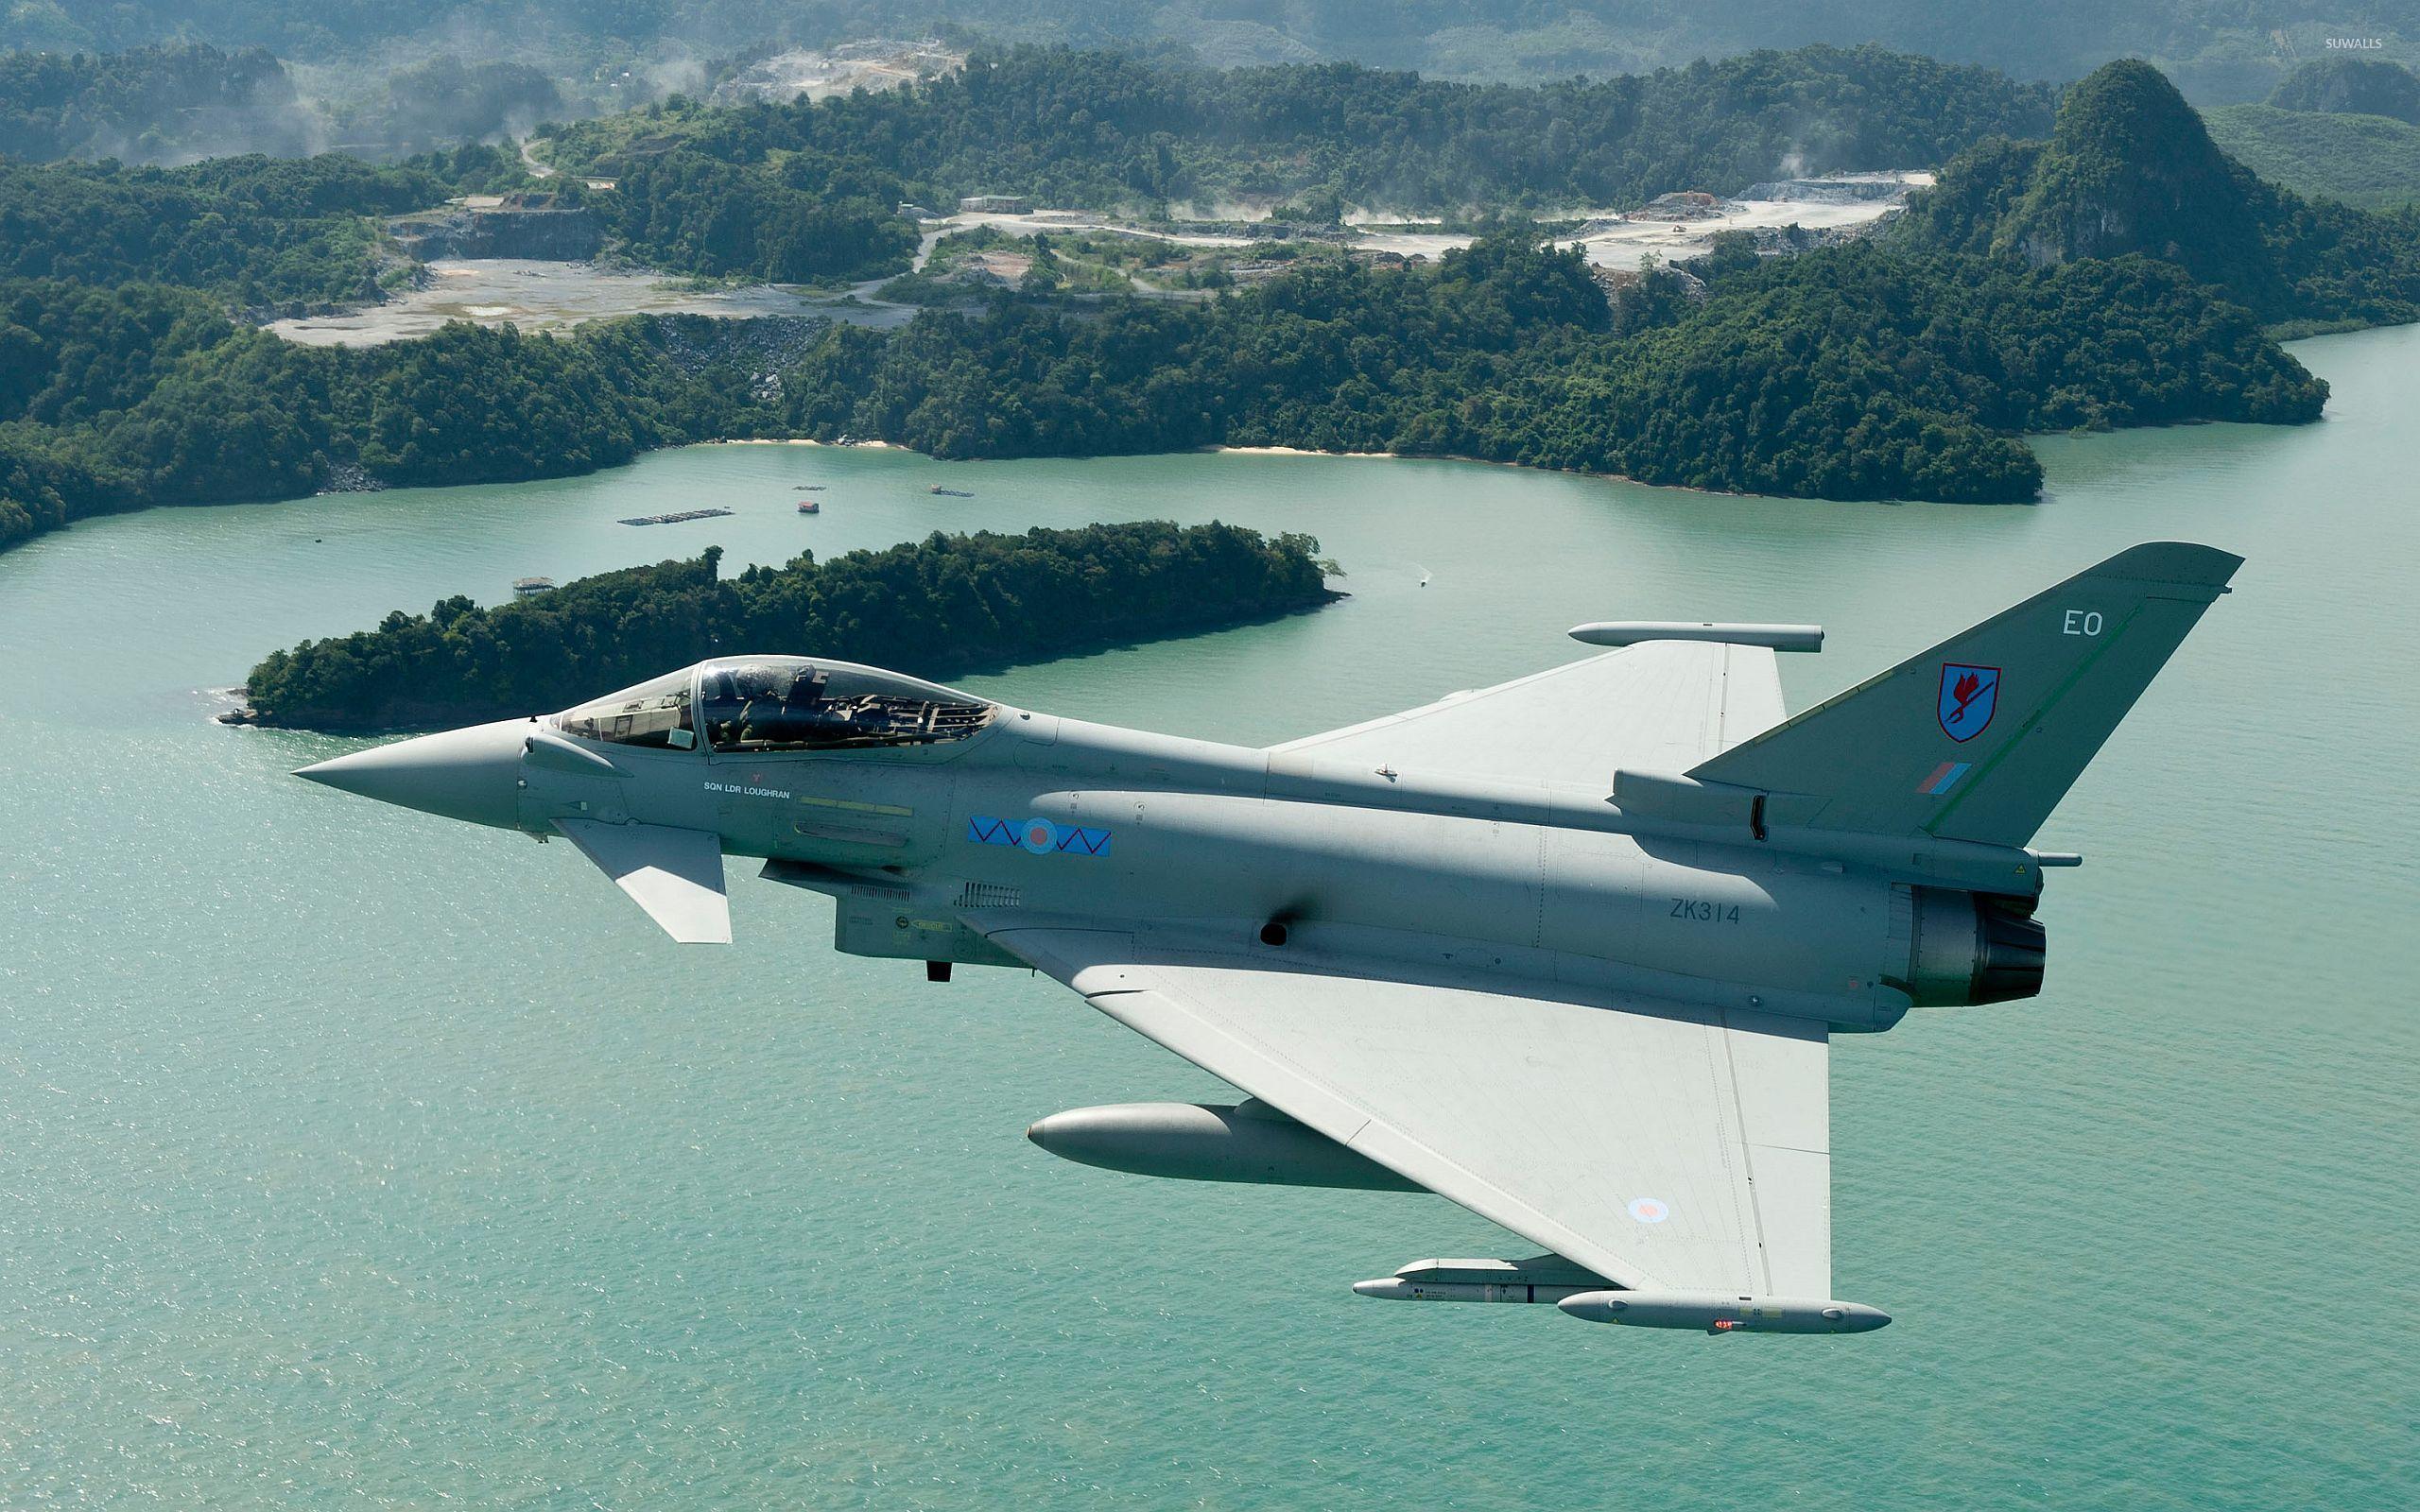 eurofighter typhoon [9] wallpaper - aircraft wallpapers - #9051